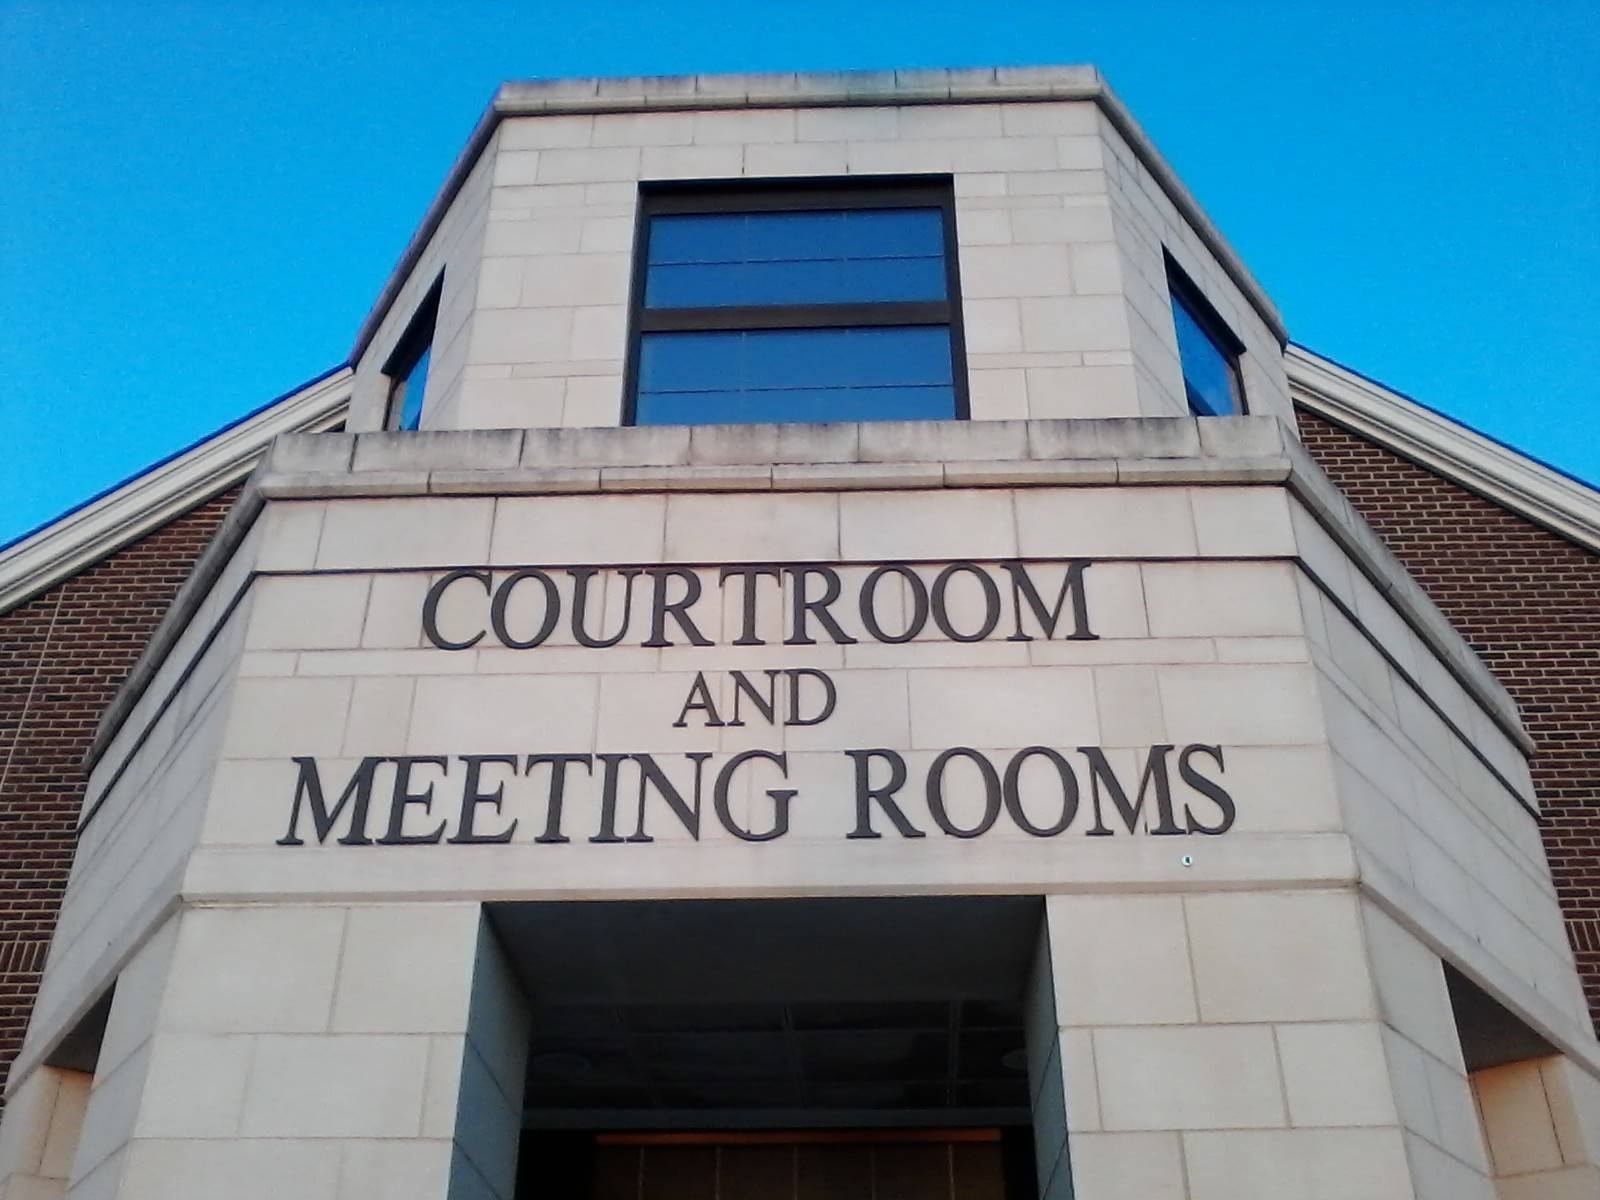 1649abf4e0bf9883f047_bridgewater_courtroom.jpg